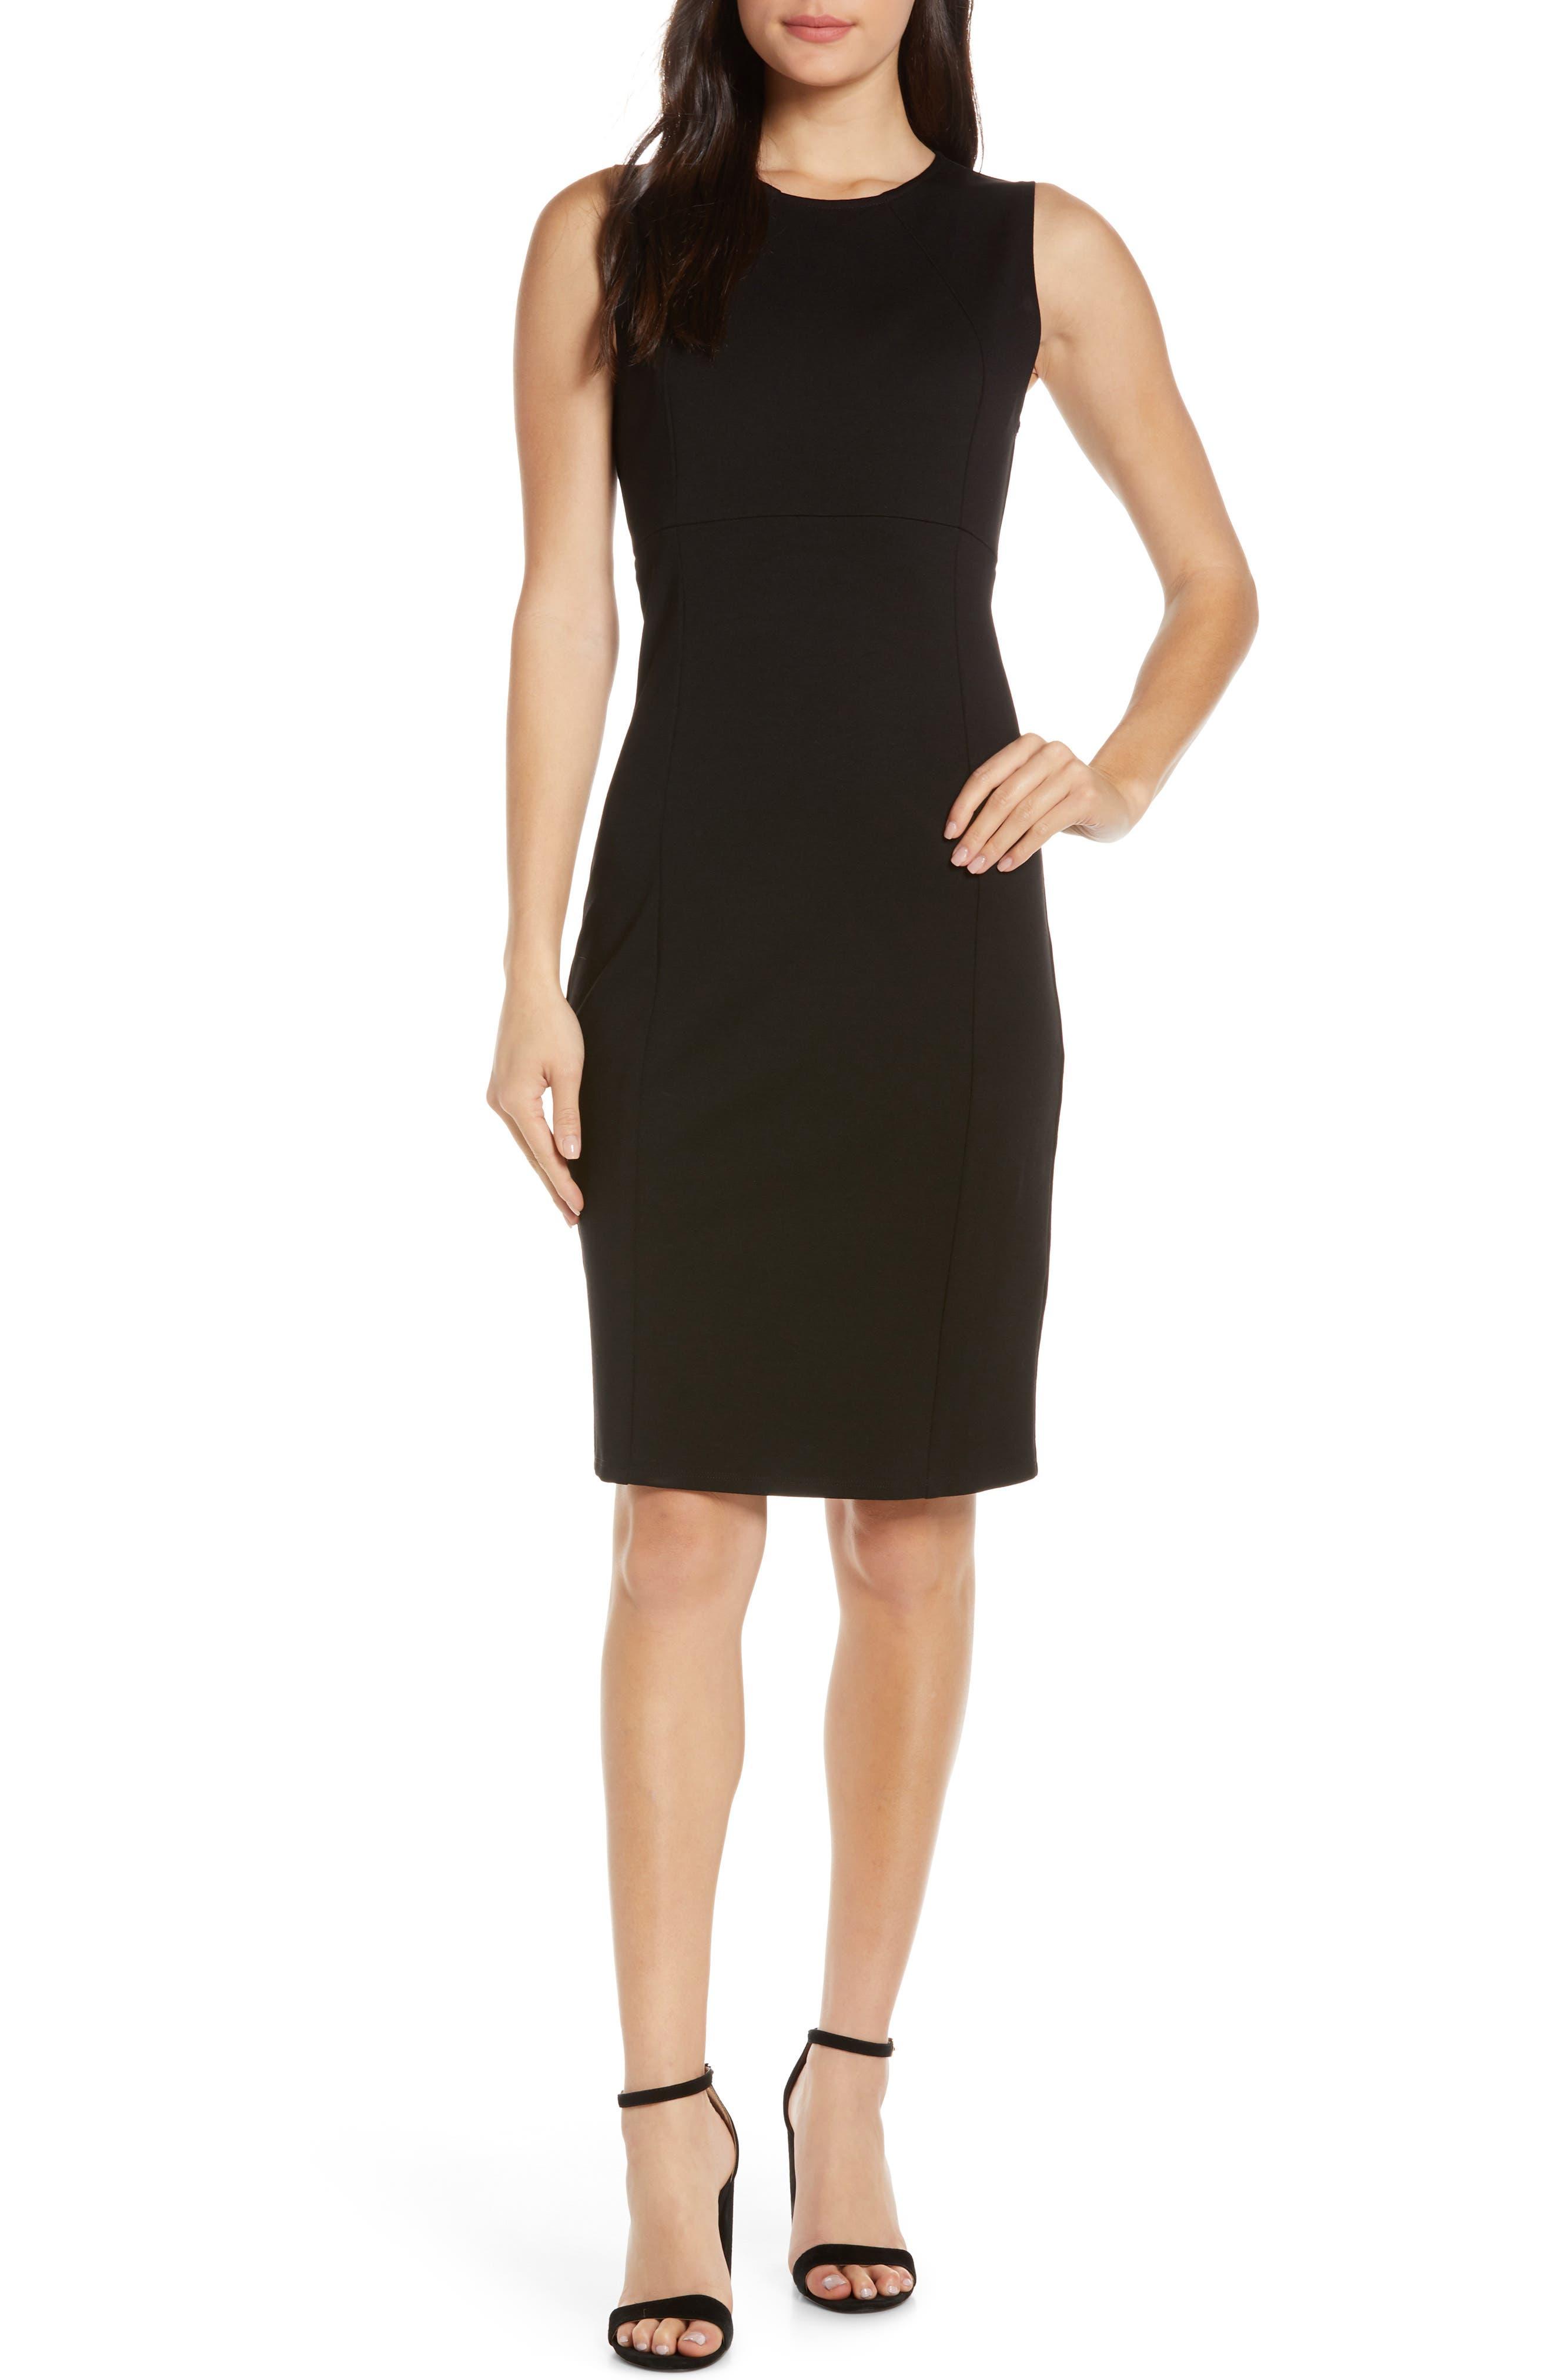 CHARLES HENRY, Sleeveless Sheath Dress, Main thumbnail 1, color, BLACK